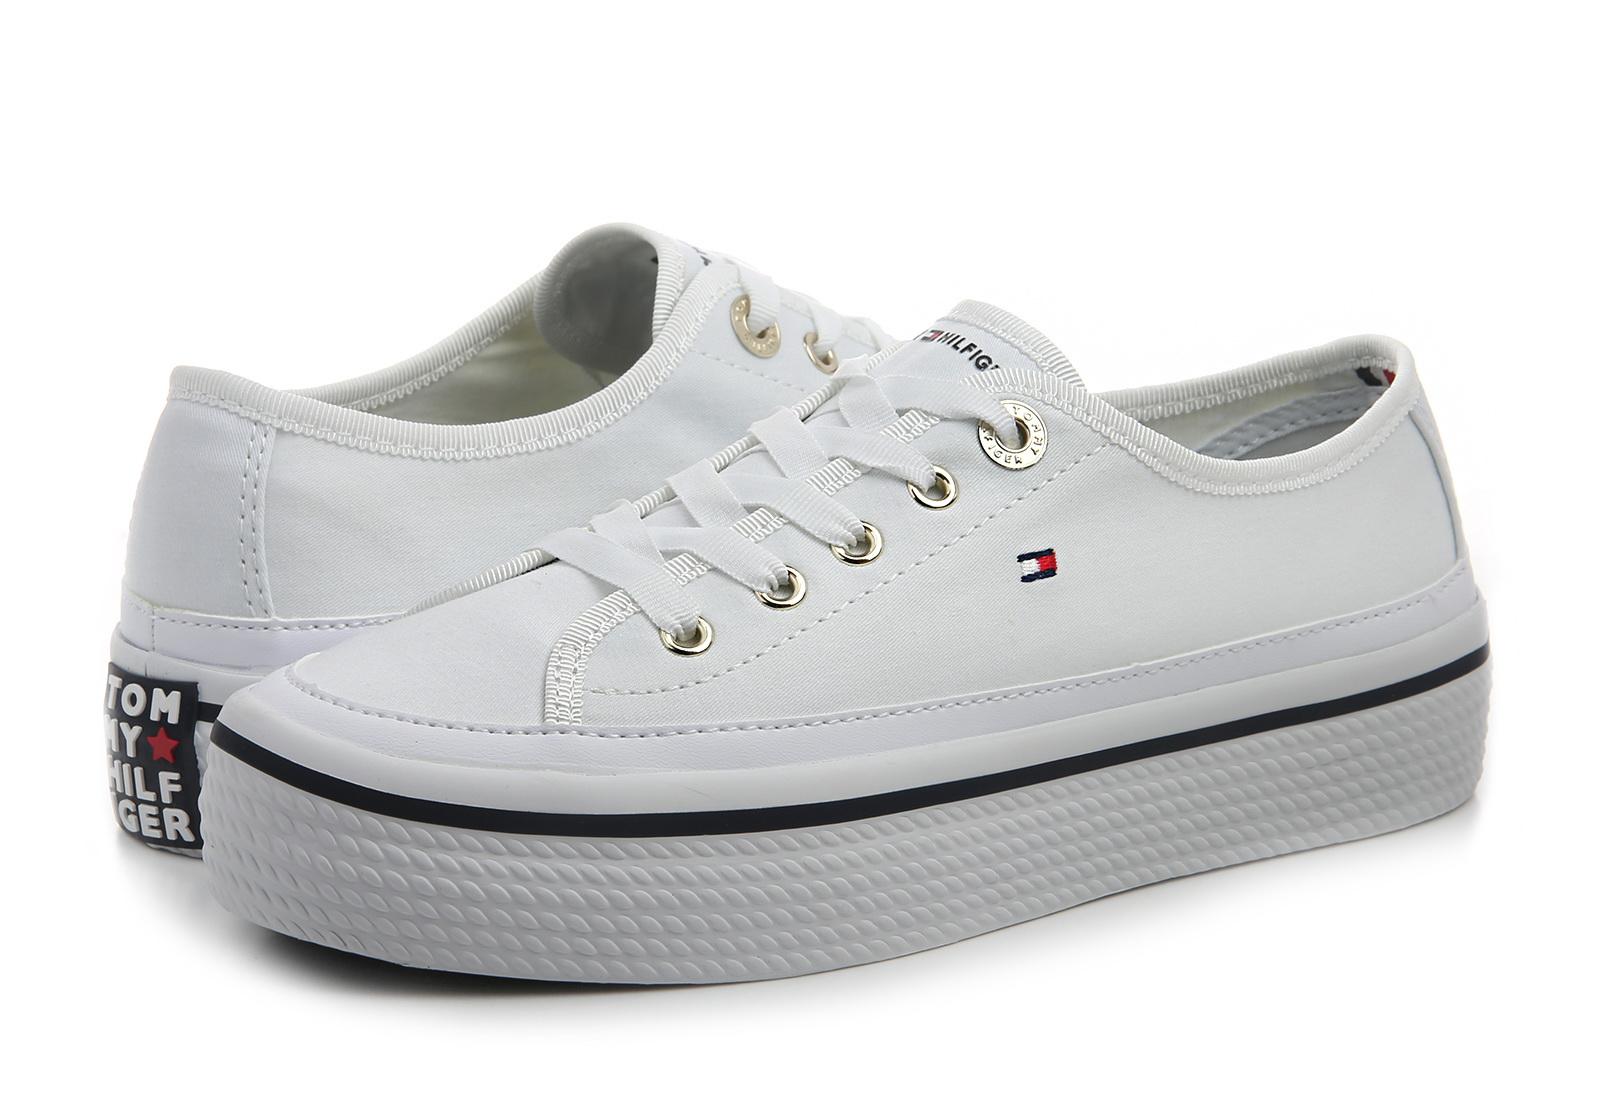 3646a4a4df4b Tommy Hilfiger Shoes - Kelsey 1d1 - 19S-4259-100 - Online shop for ...